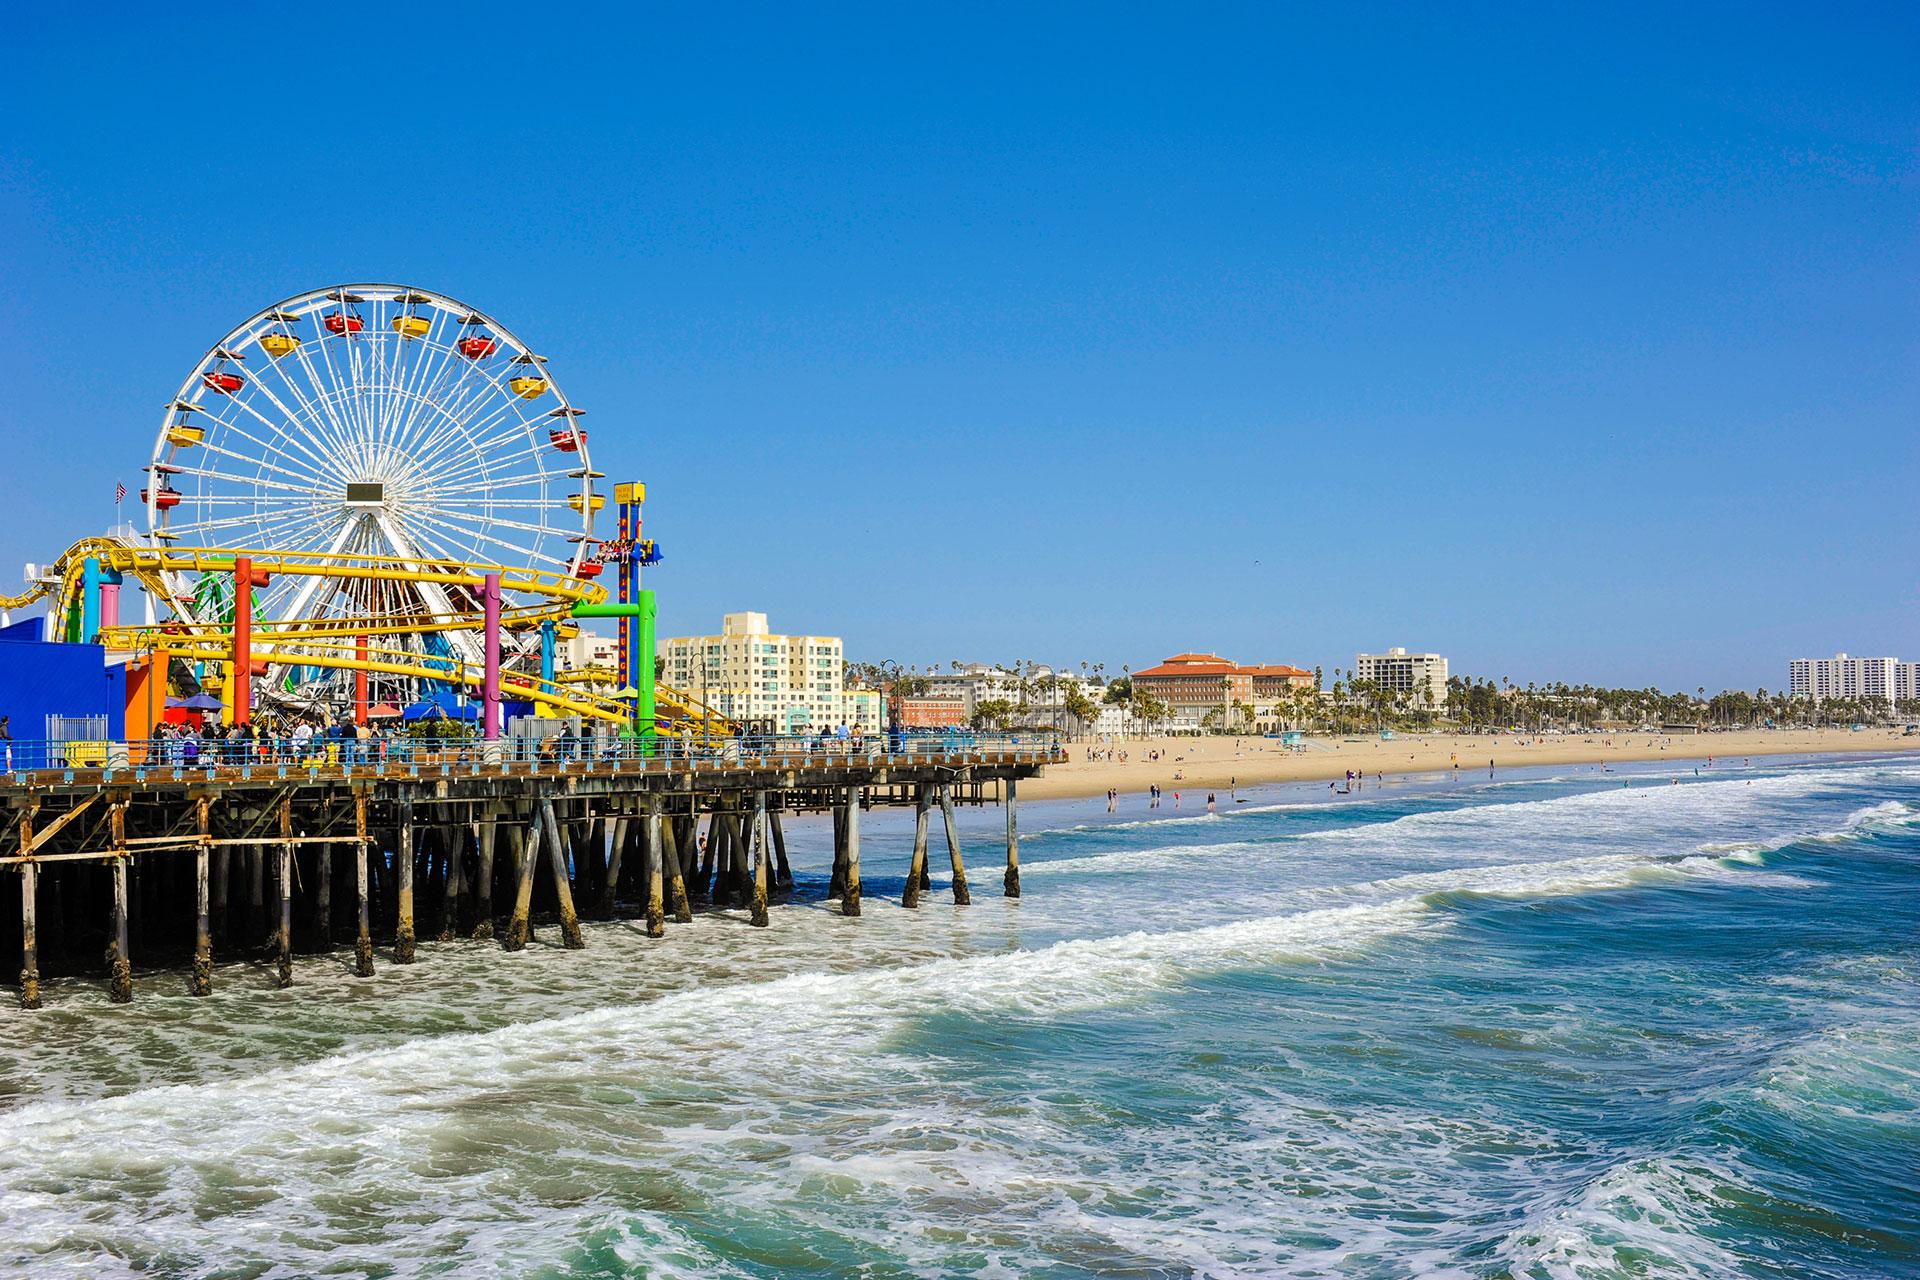 Santa Monica Pier, Californial Courtesy Shutterstock